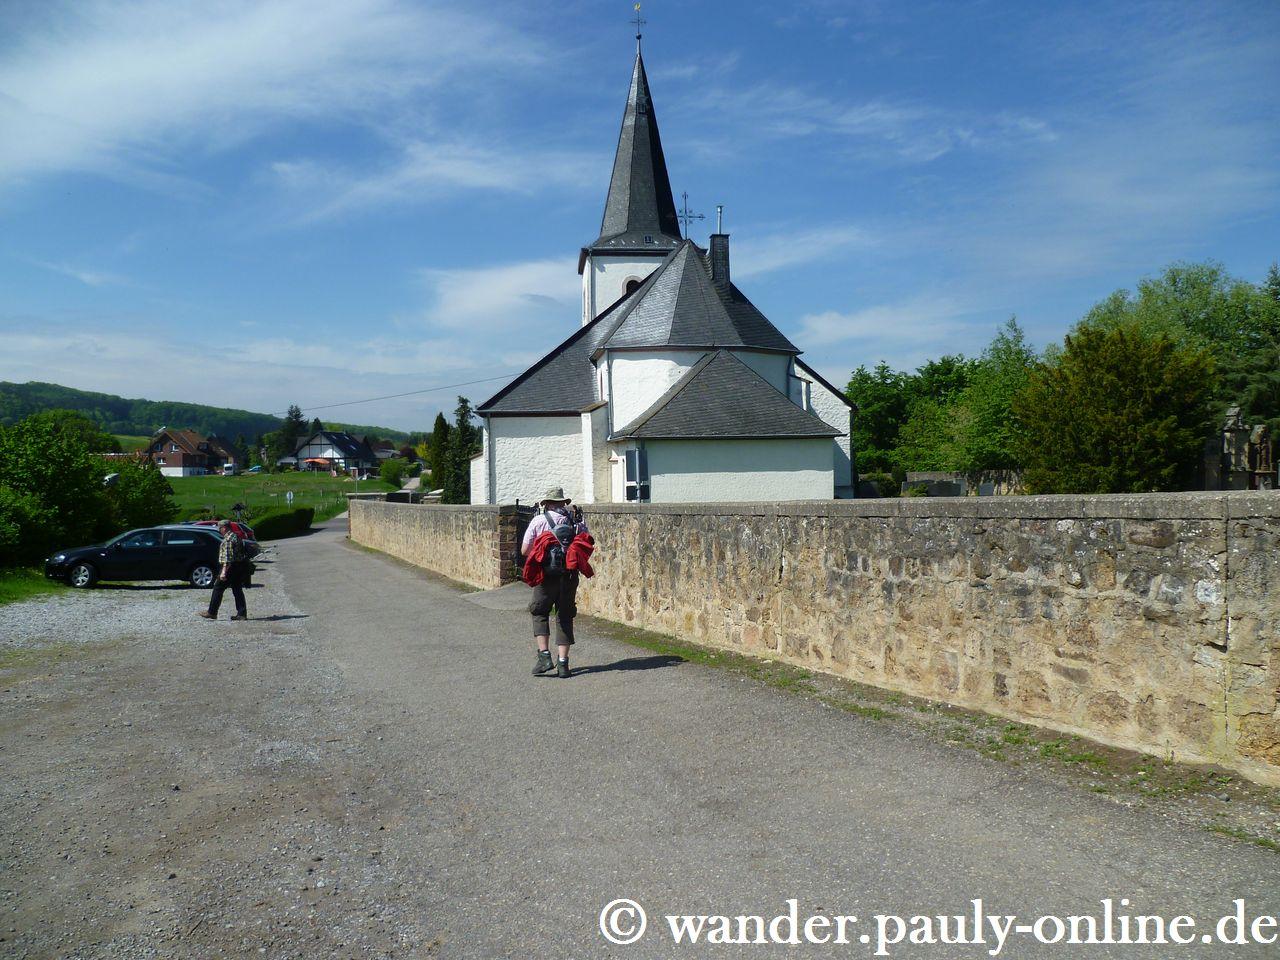 Pfarrkirche St. Cyriacus in Weyer